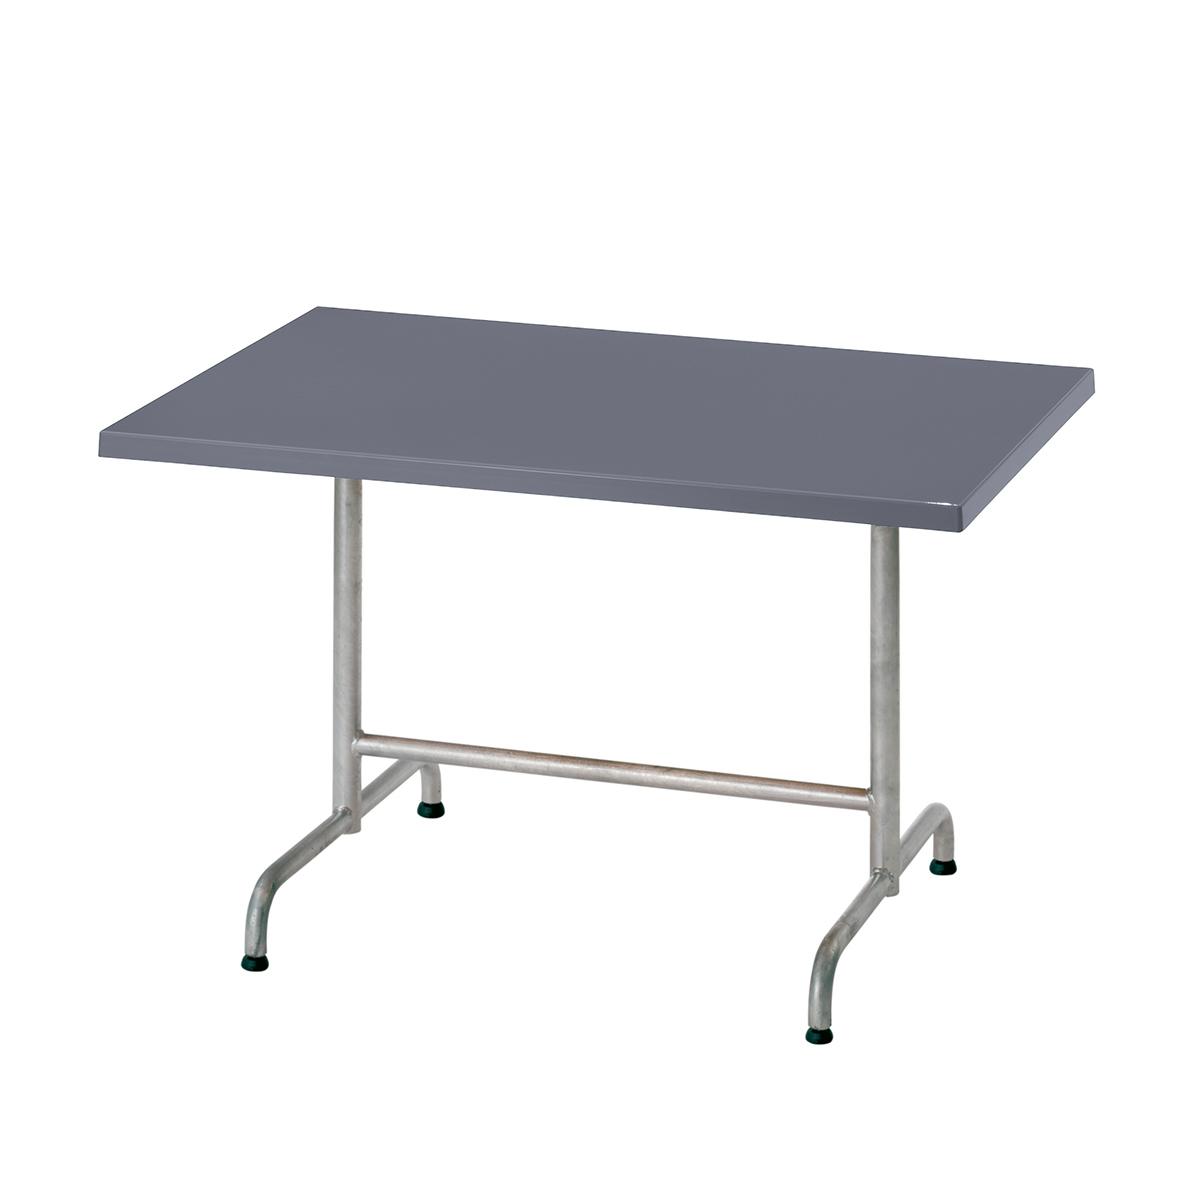 GFK Tisch fehgrau 120x80